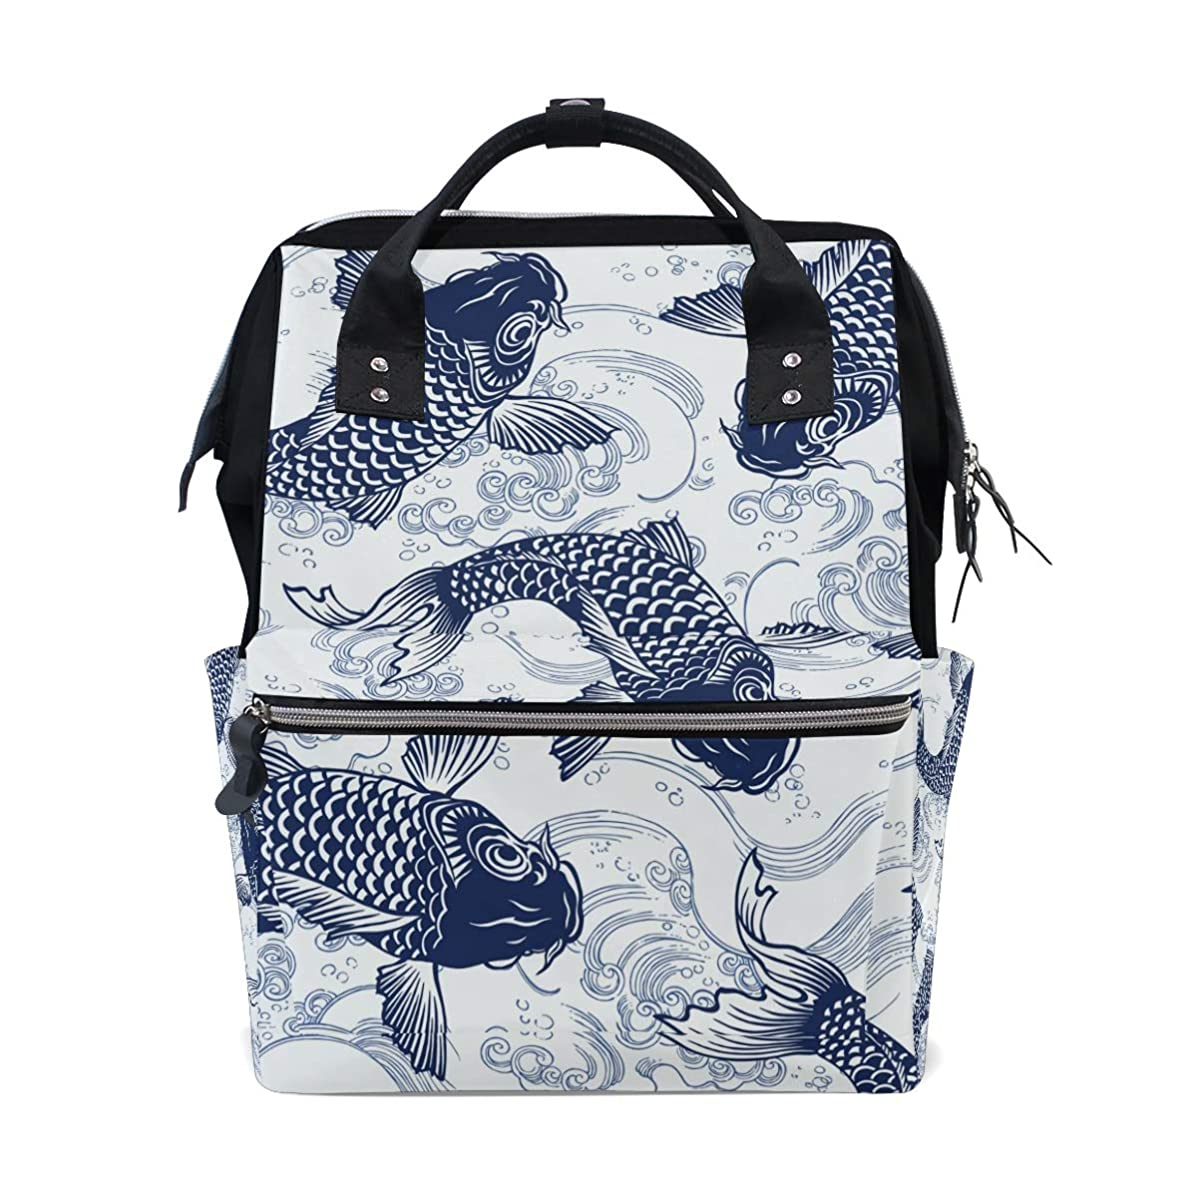 Carp Fishes School Backpack Large Capacity Mummy Bags Laptop Handbag Casual Travel Rucksack Satchel For Women Men Adult Teen Children